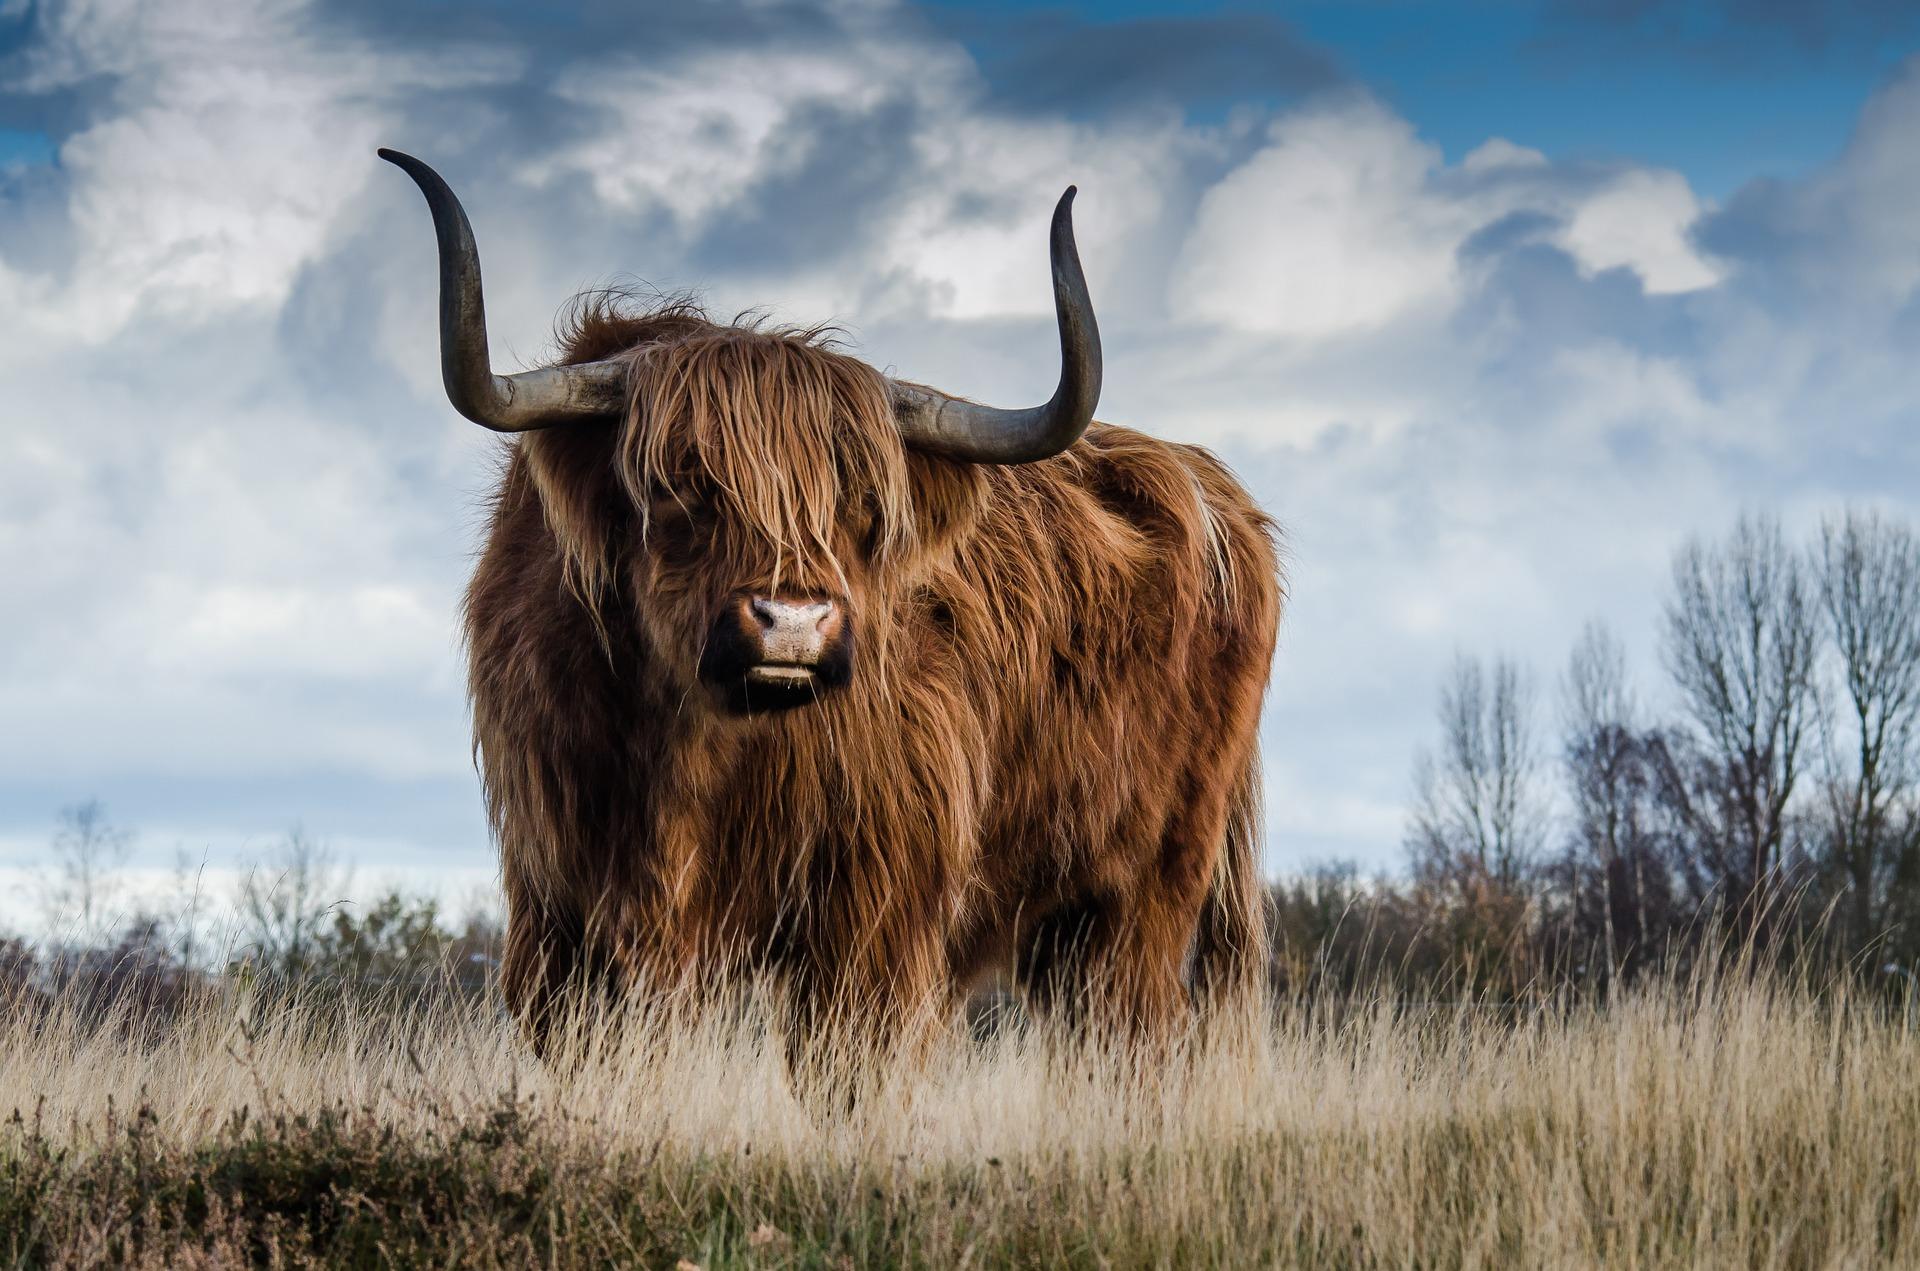 Toro, Hörner, Vieh, Bauernhof, Wolken - Wallpaper HD - Prof.-falken.com